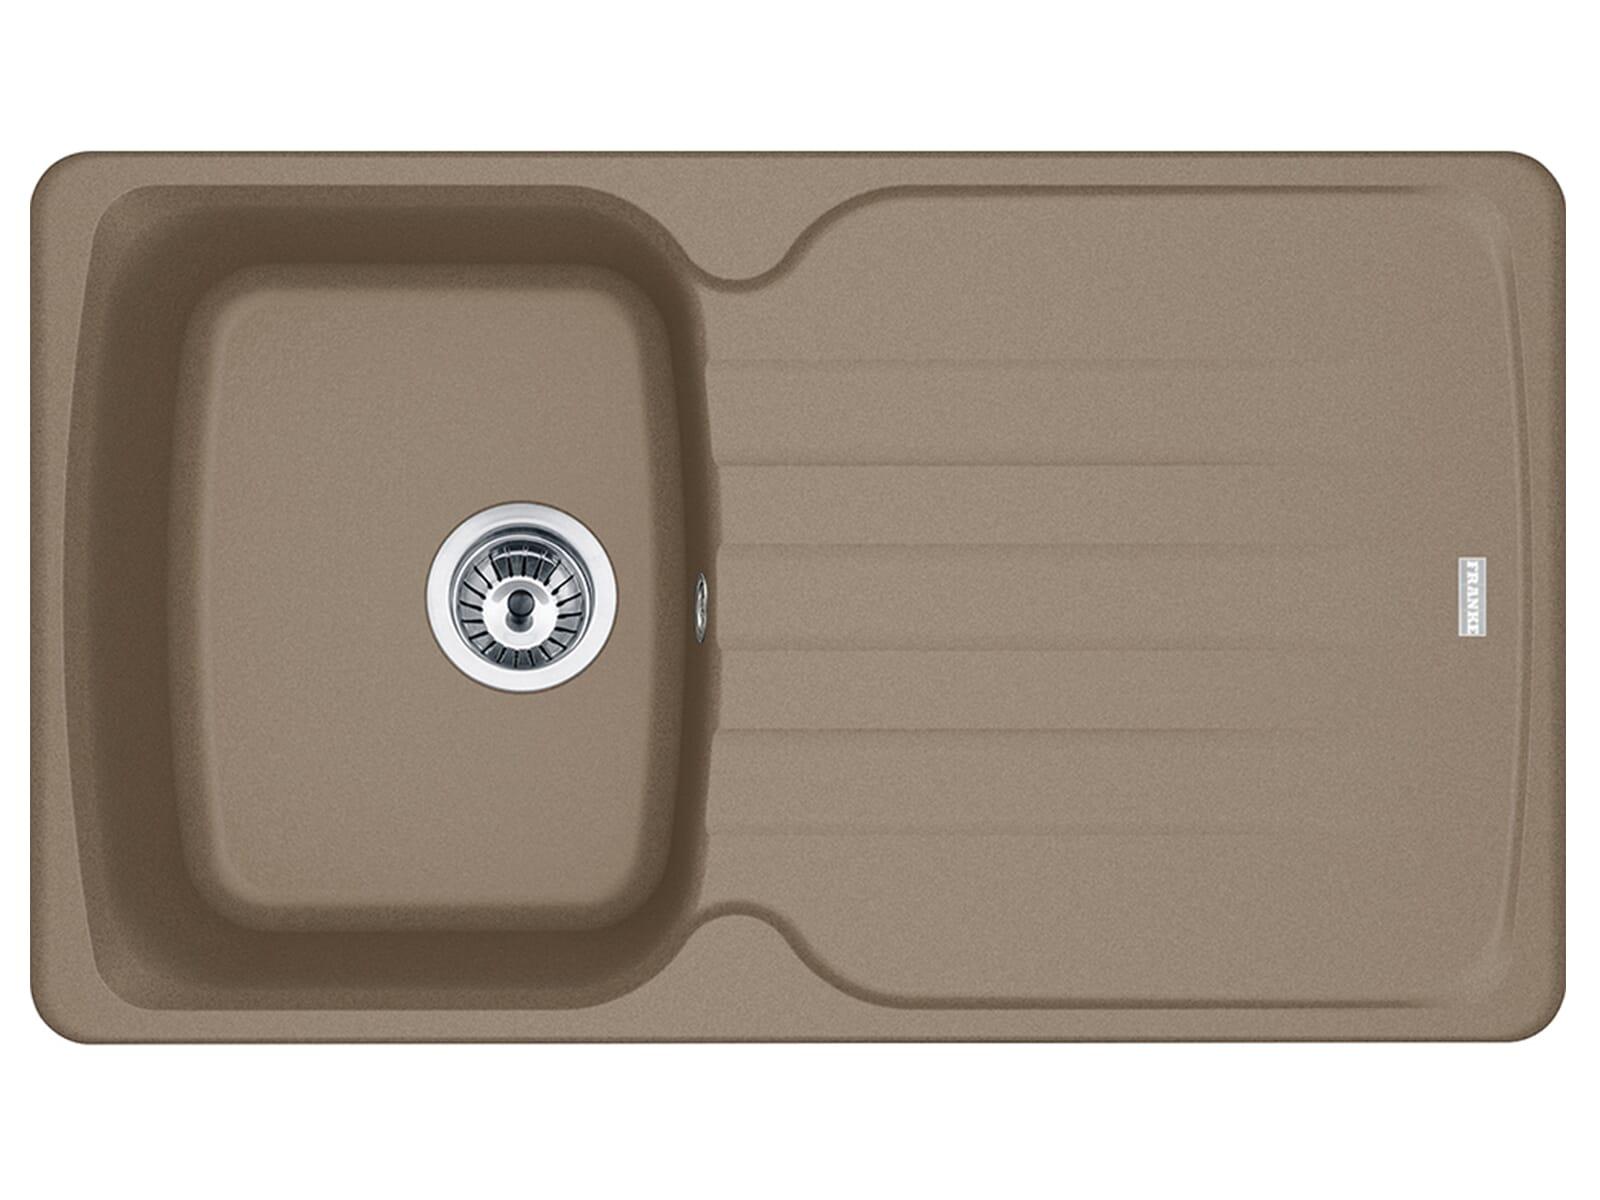 Franke Antea AZG 611 Cashmere - 114.0477.979 Granitspüle Exzenterbetätigung